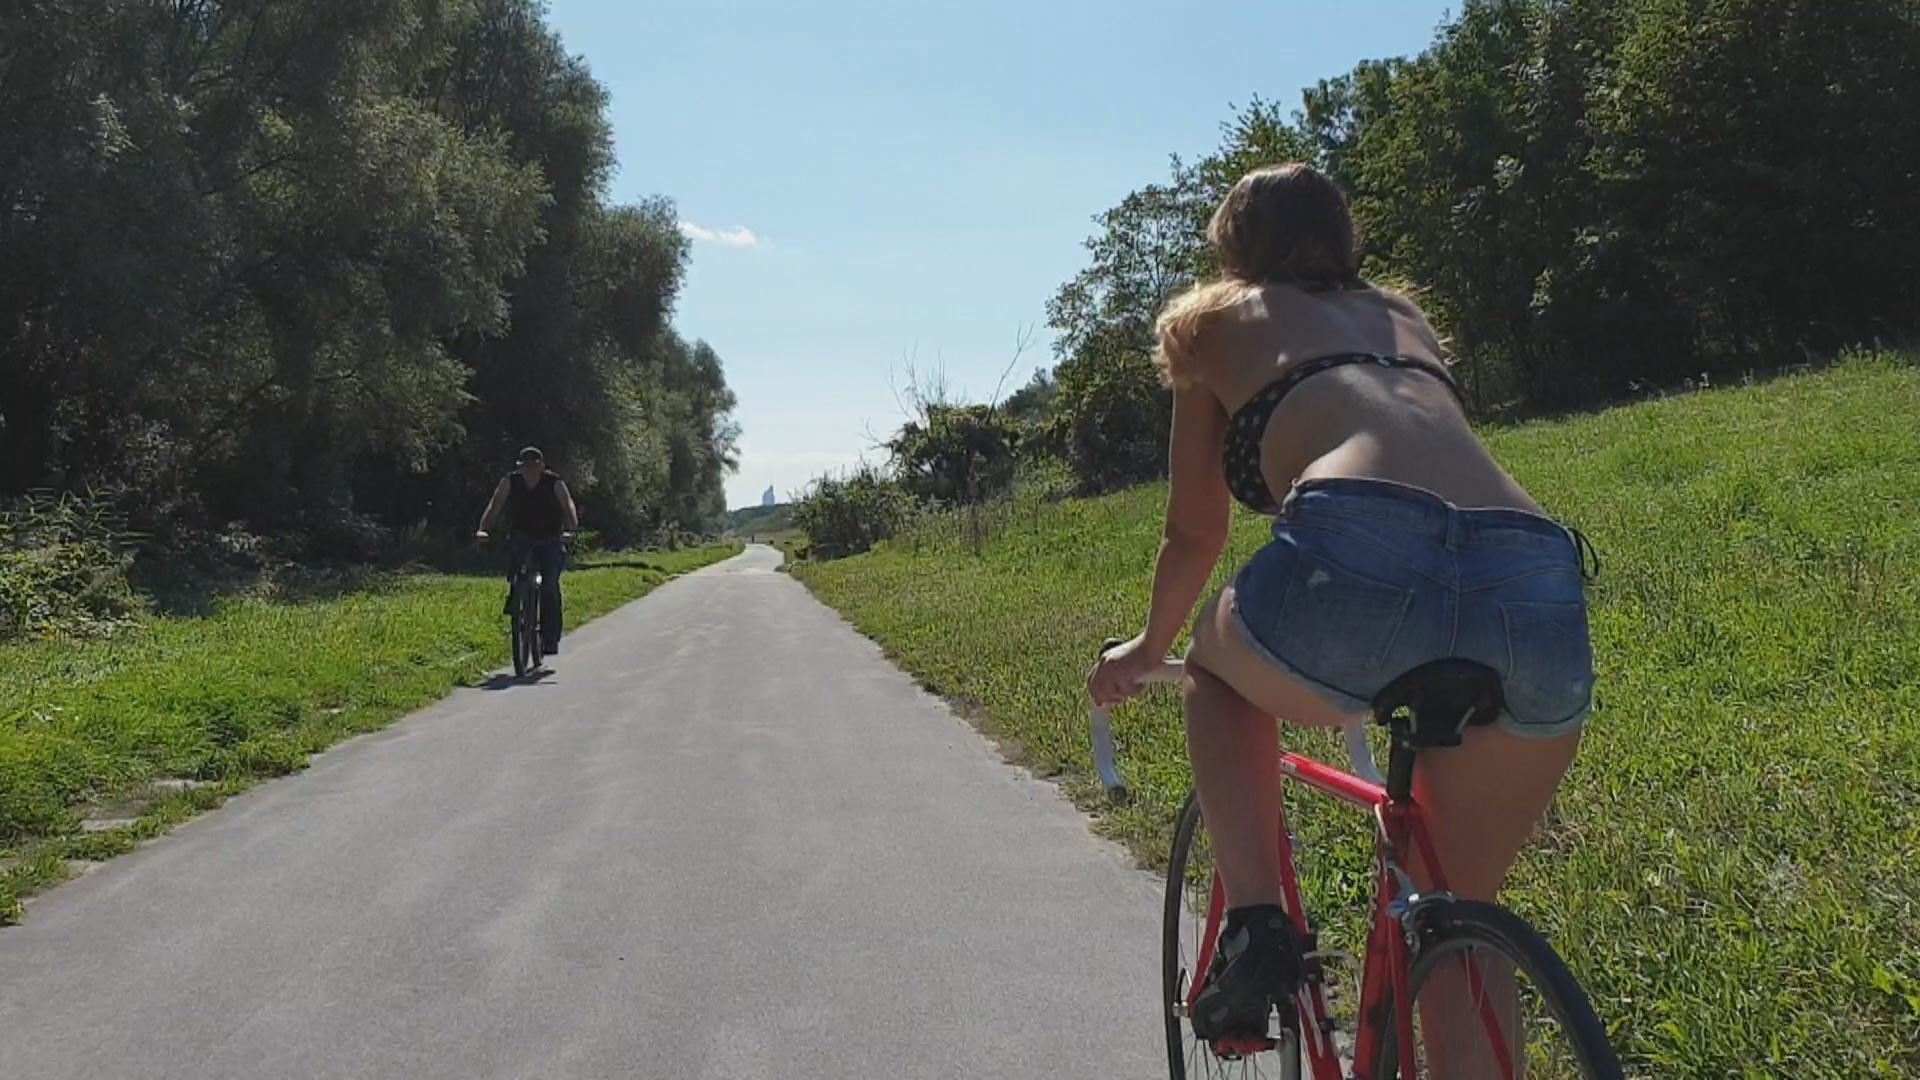 KamiKatze - Am Fahrrad vor dir fährt ne geile Ficksau